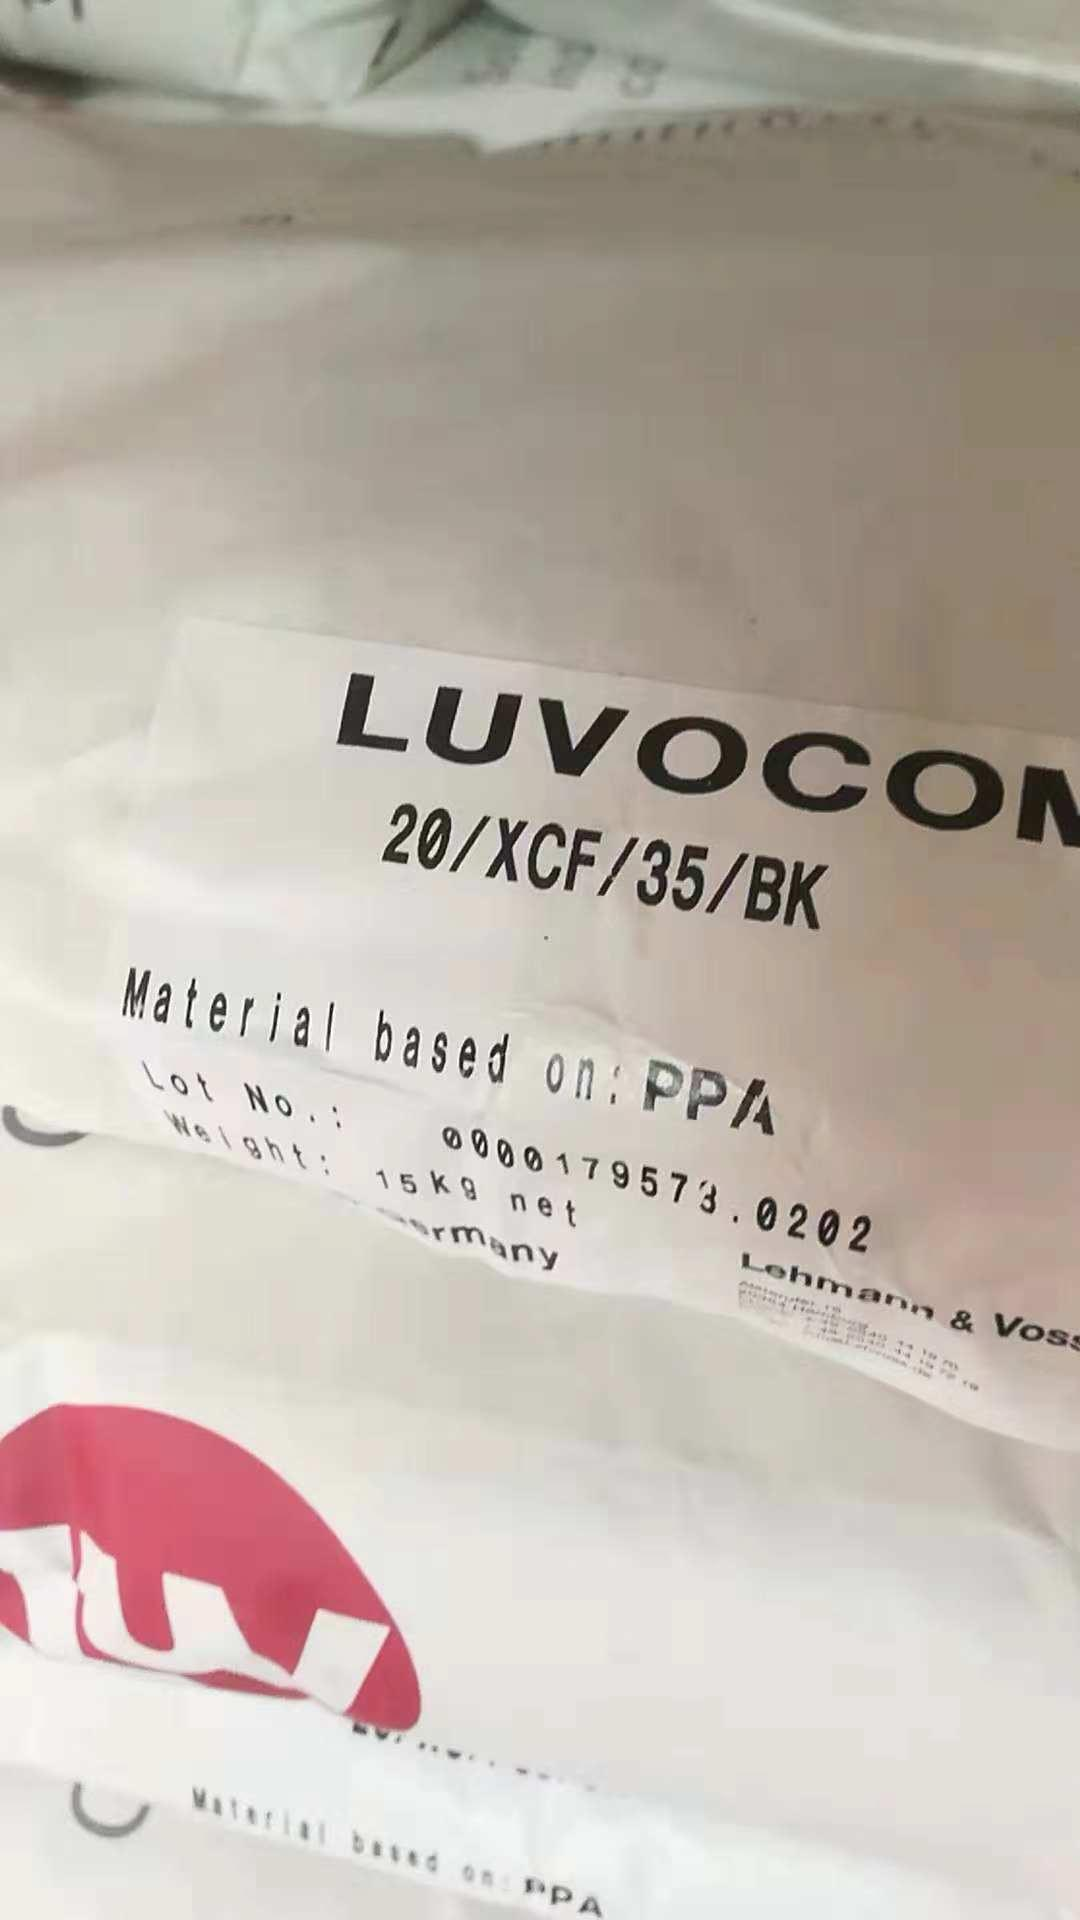 LUVOCOM 20/XCF/35/BK